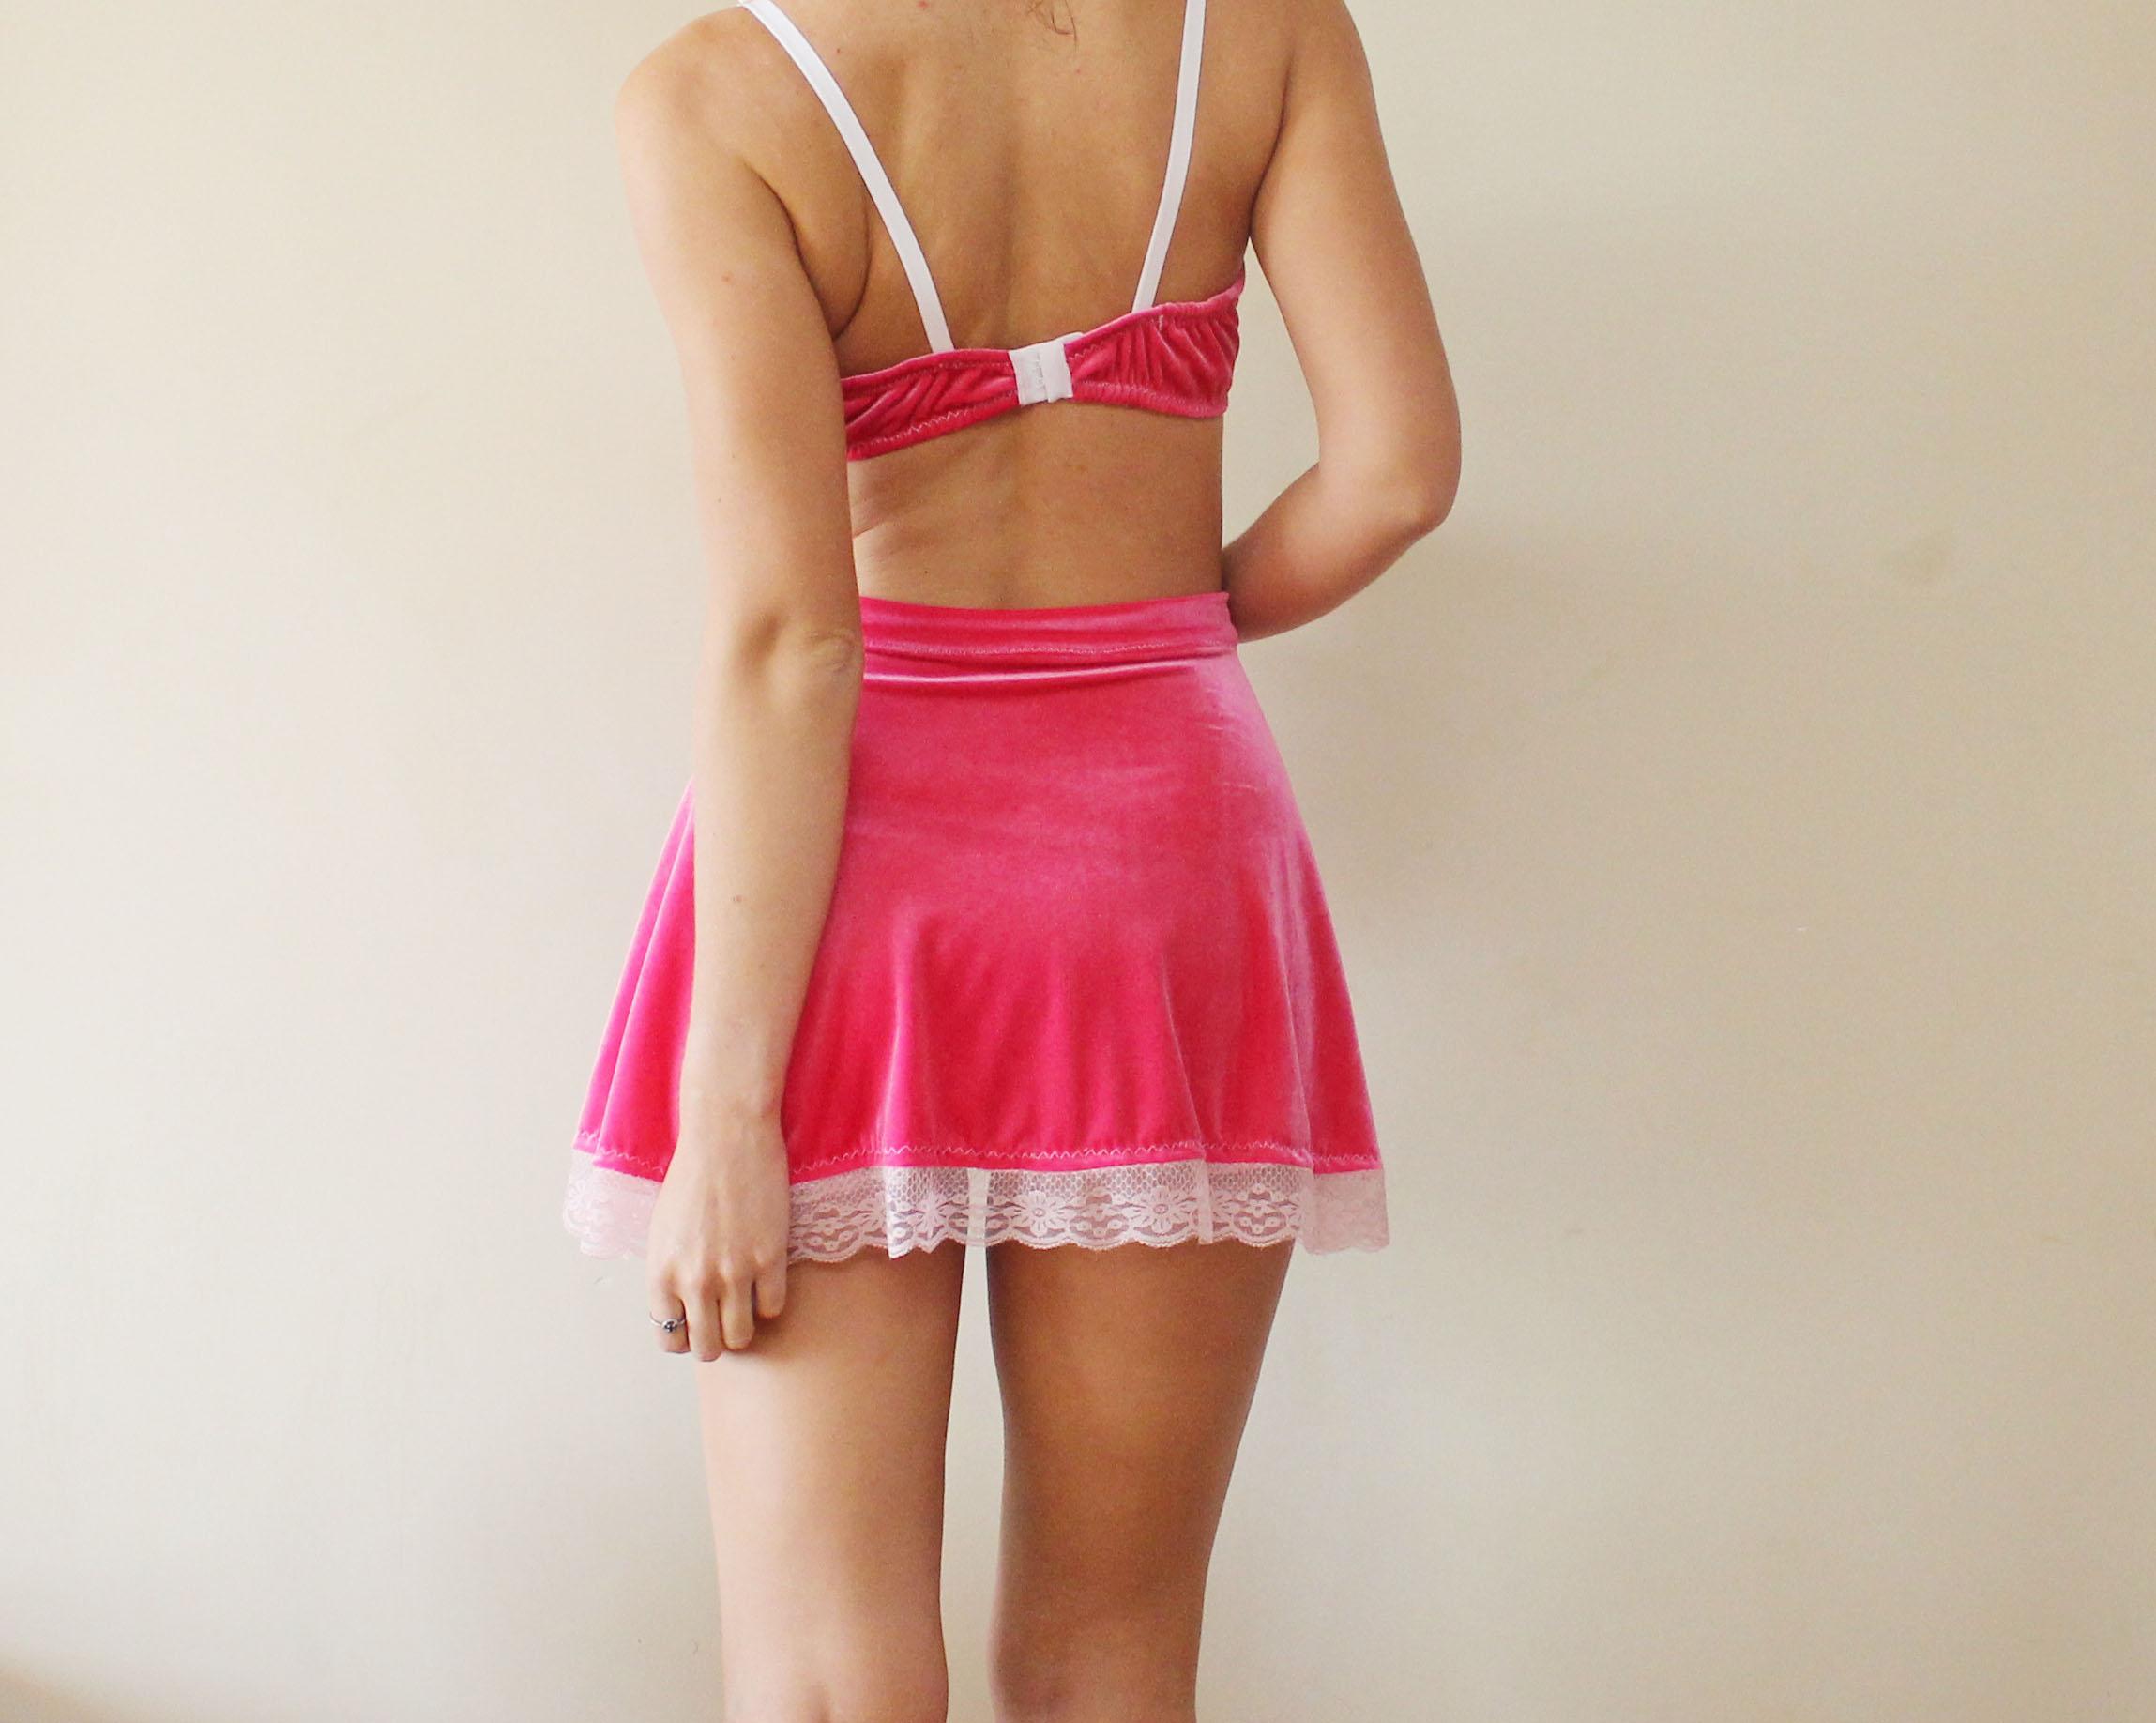 b0f73bddf8 CUPCAKE   Hot pink velvet lingerie set bralette and panties erotic ...